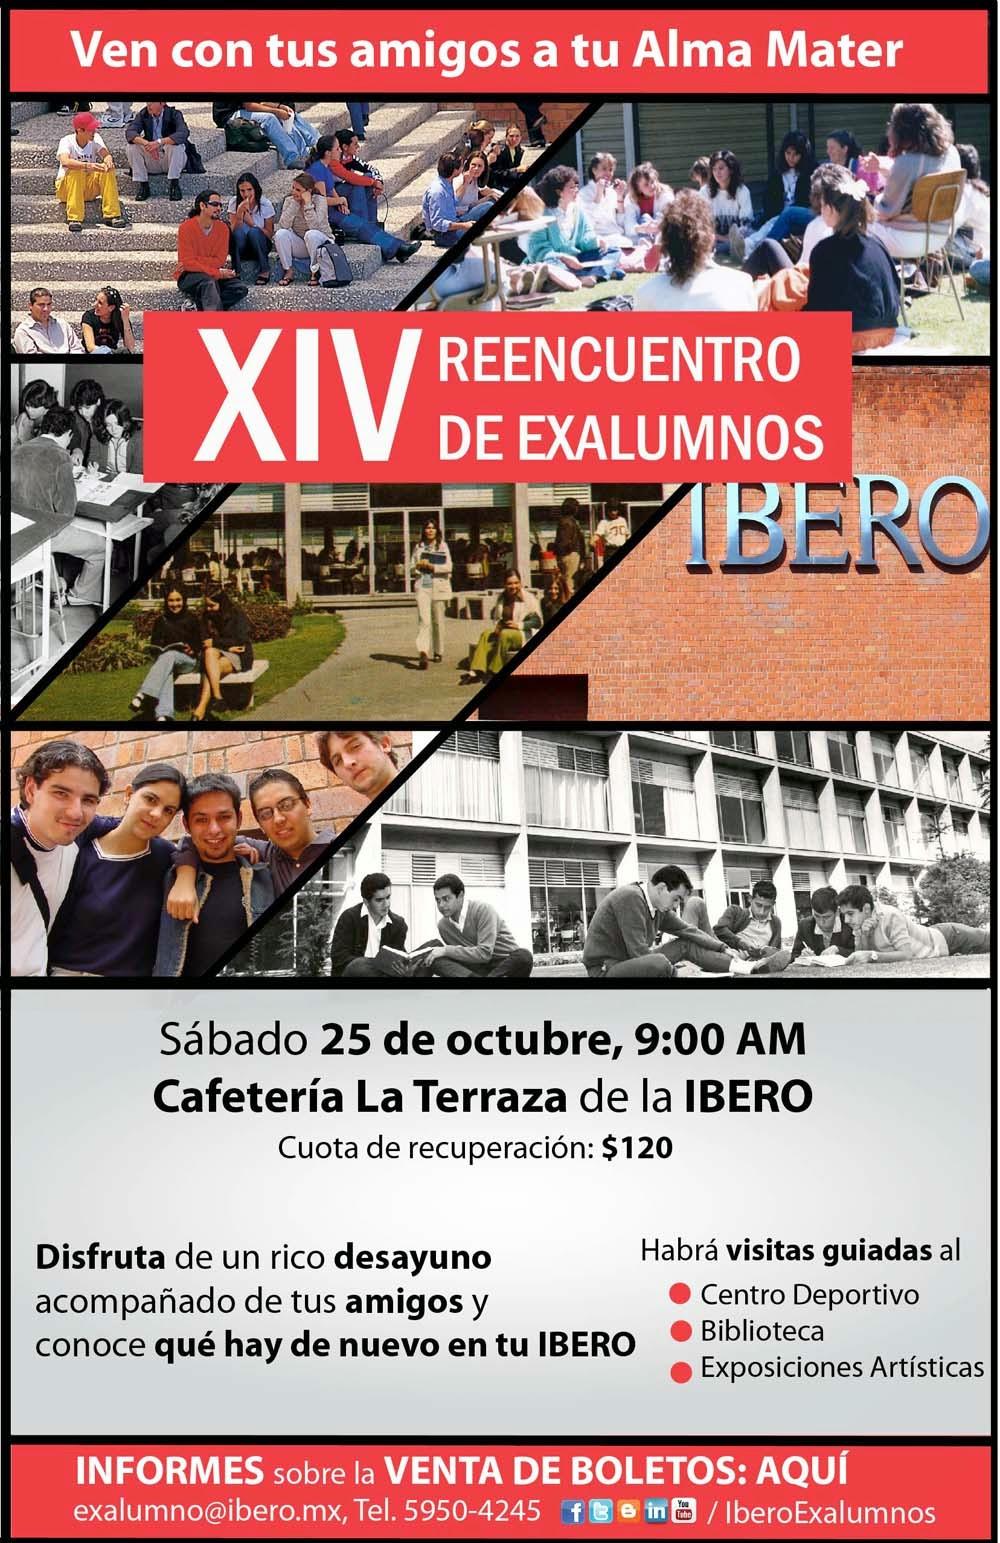 http://iberoexalumnos.blogspot.mx/2014/09/reencuentro-de-exalumnos.html